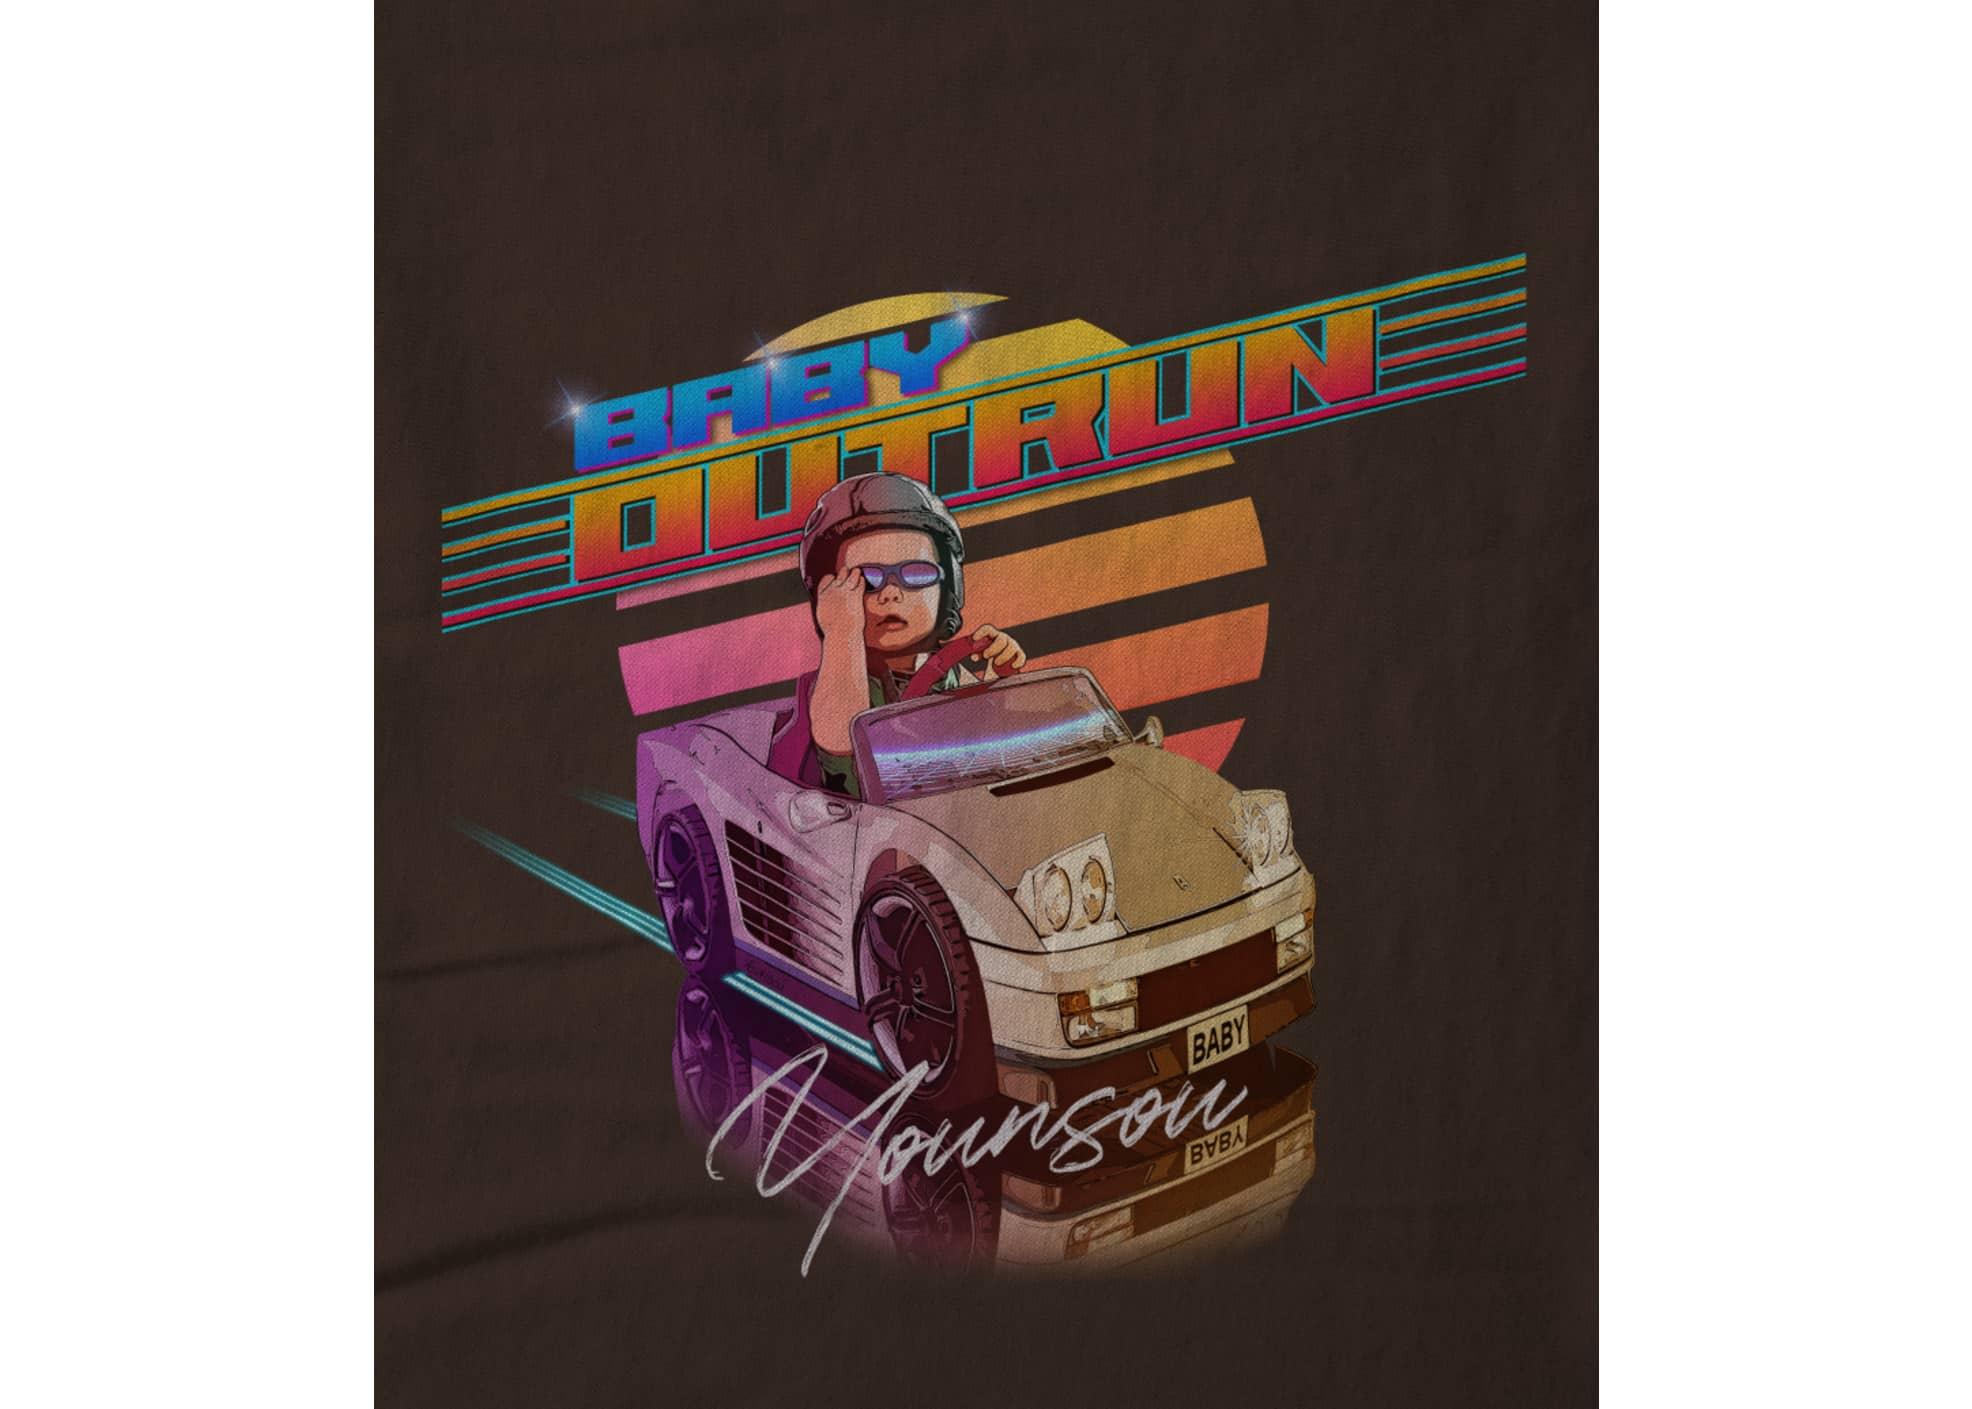 Younsou baby outrun 1625253206